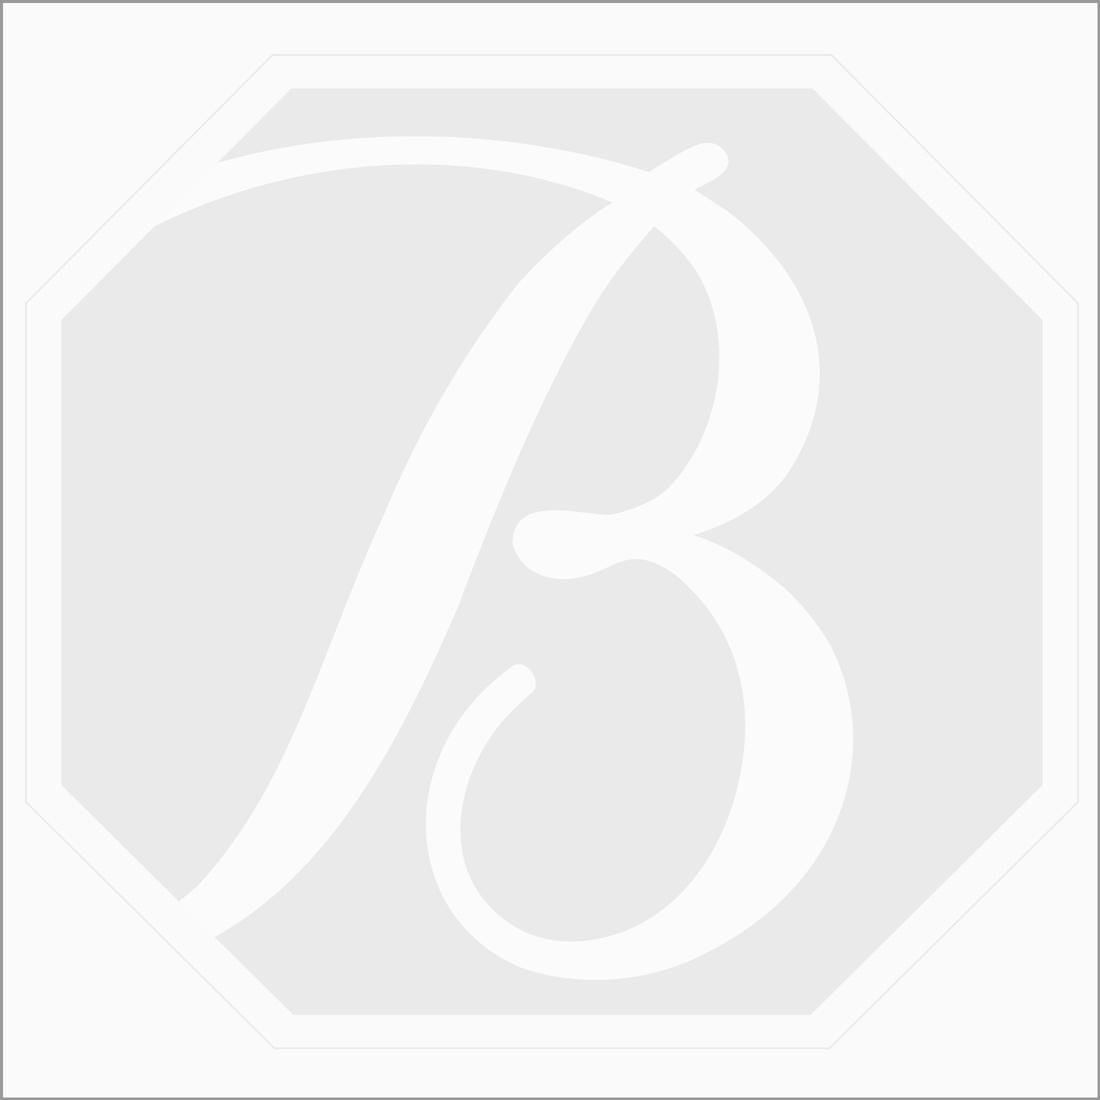 9 x 7.50 mm - Medium Gray Rose Cut Diamond Cushion Shape - 3.58 carats (FncyDiaRC1001)